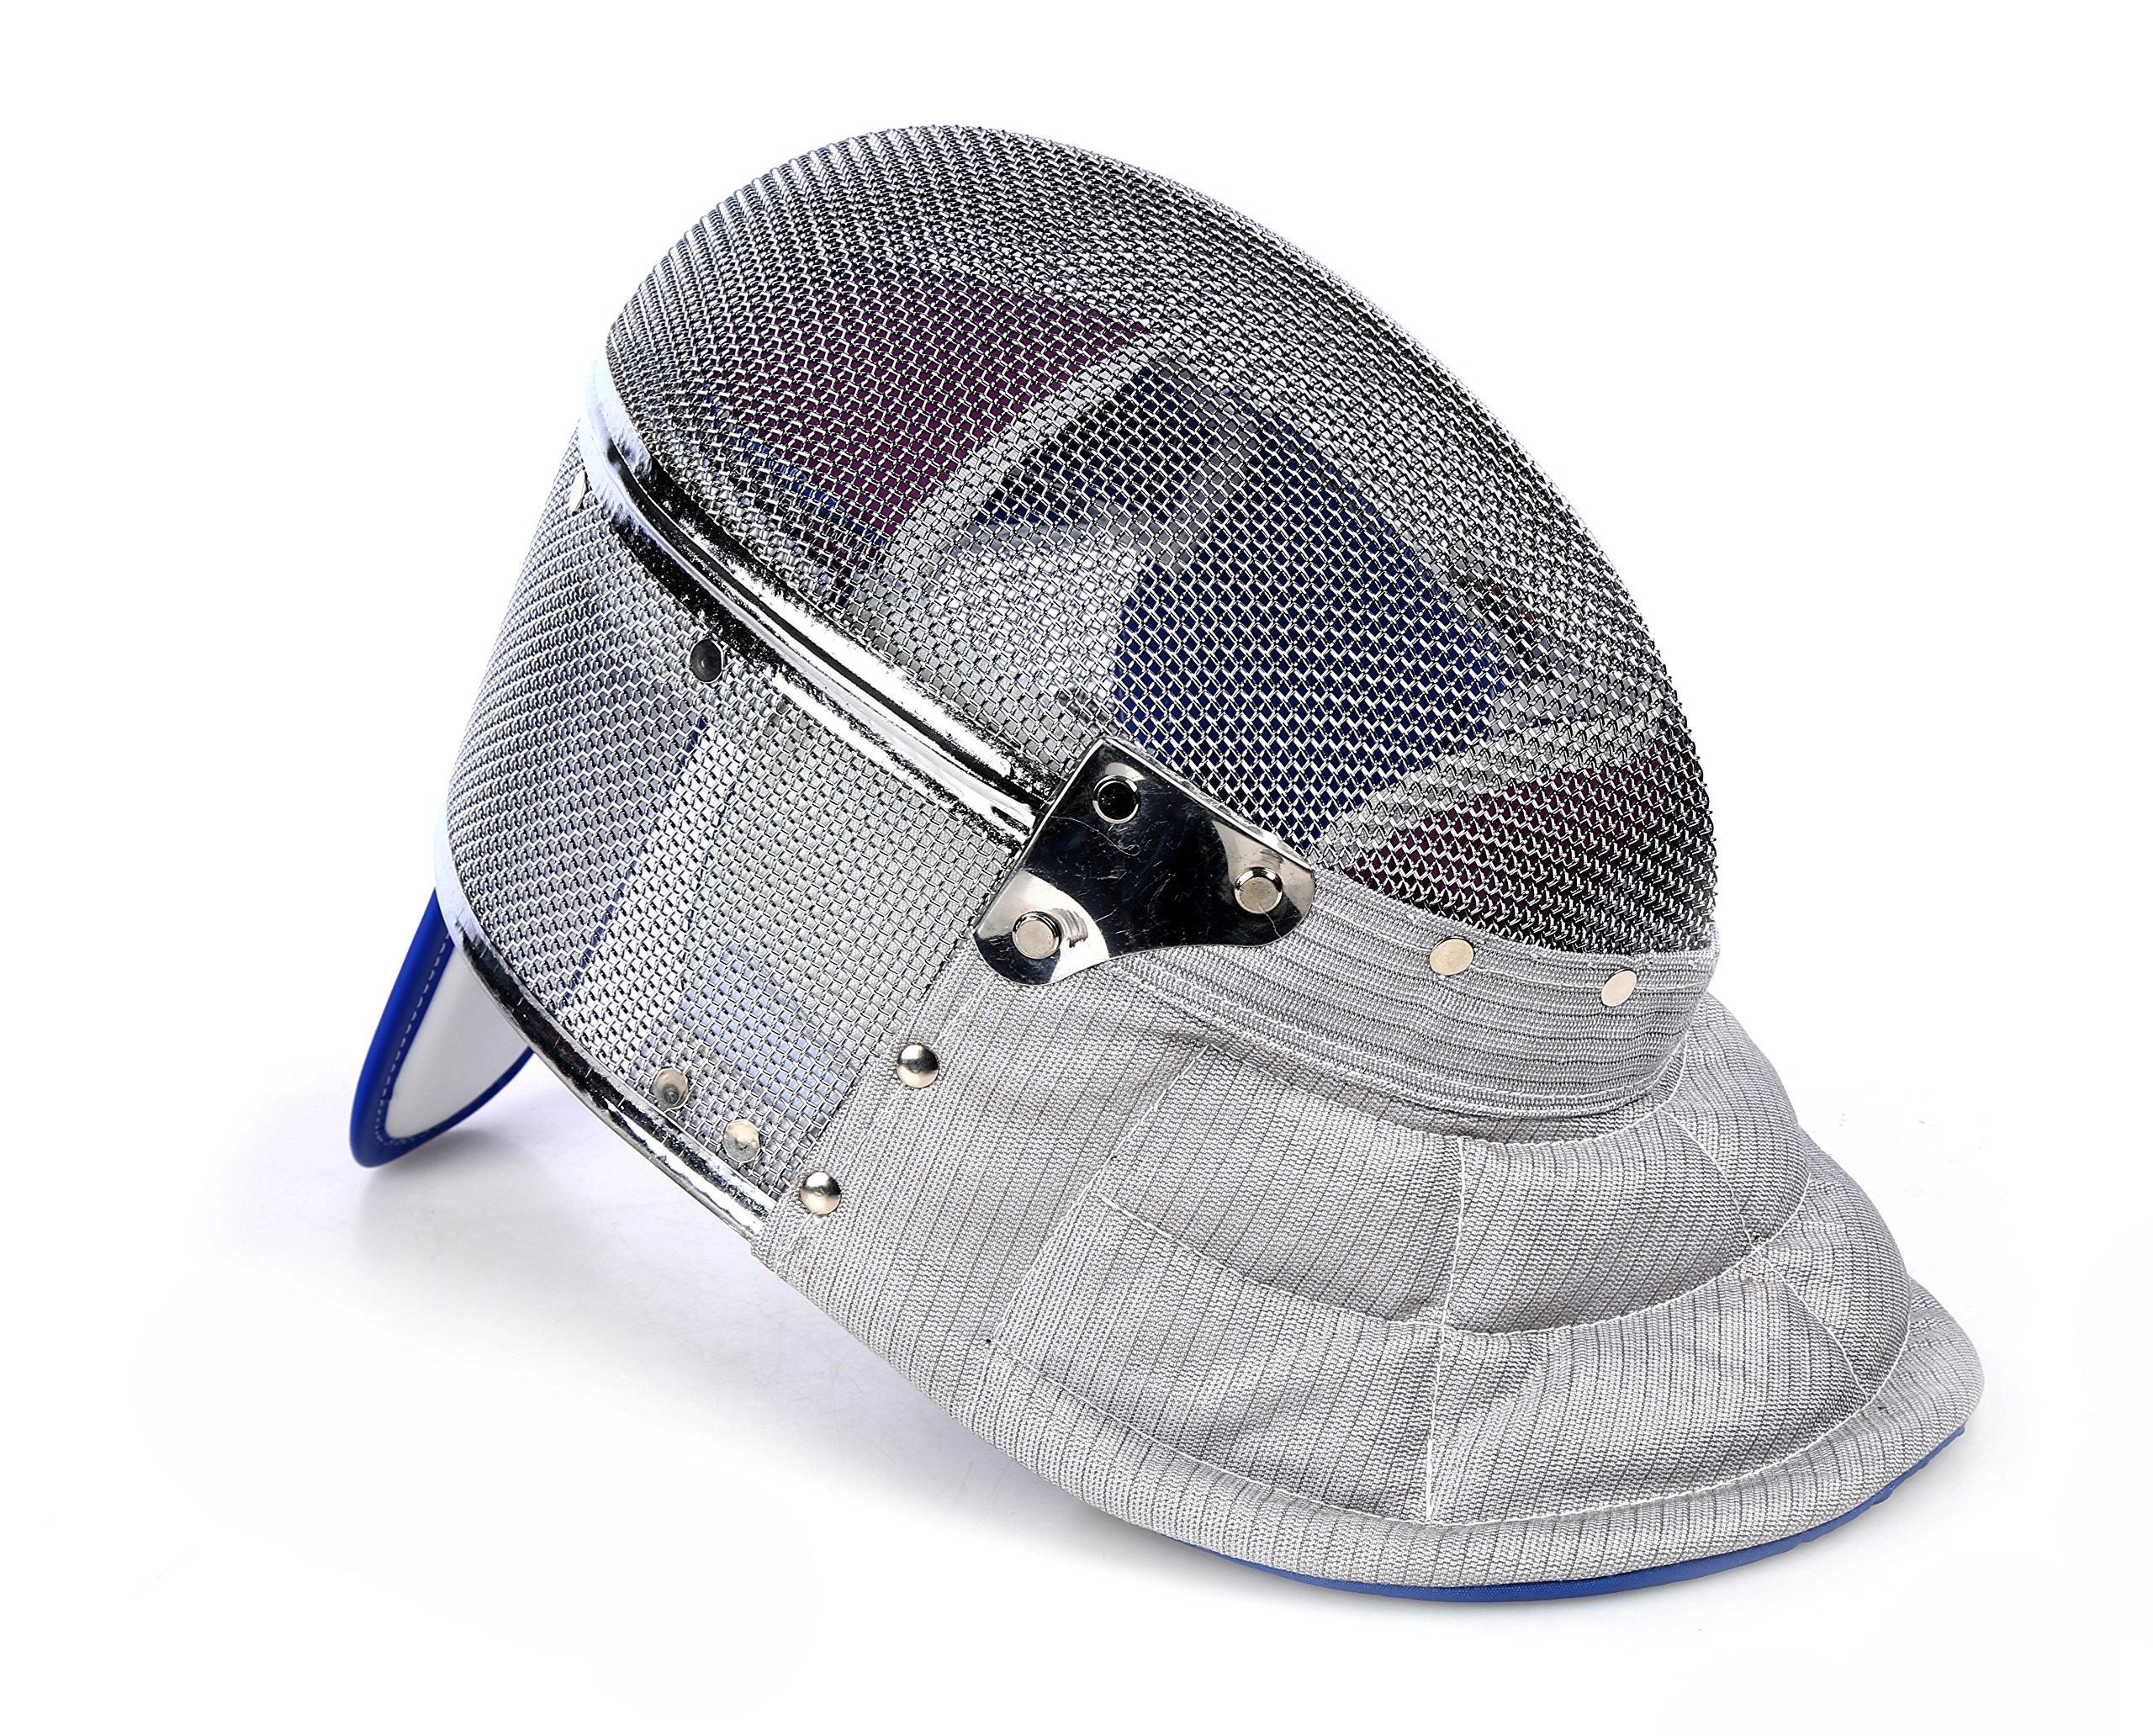 e63b7e29682ae LEONARK Fencing Saber Mask CE 350N Certified National Grade Masque product  image